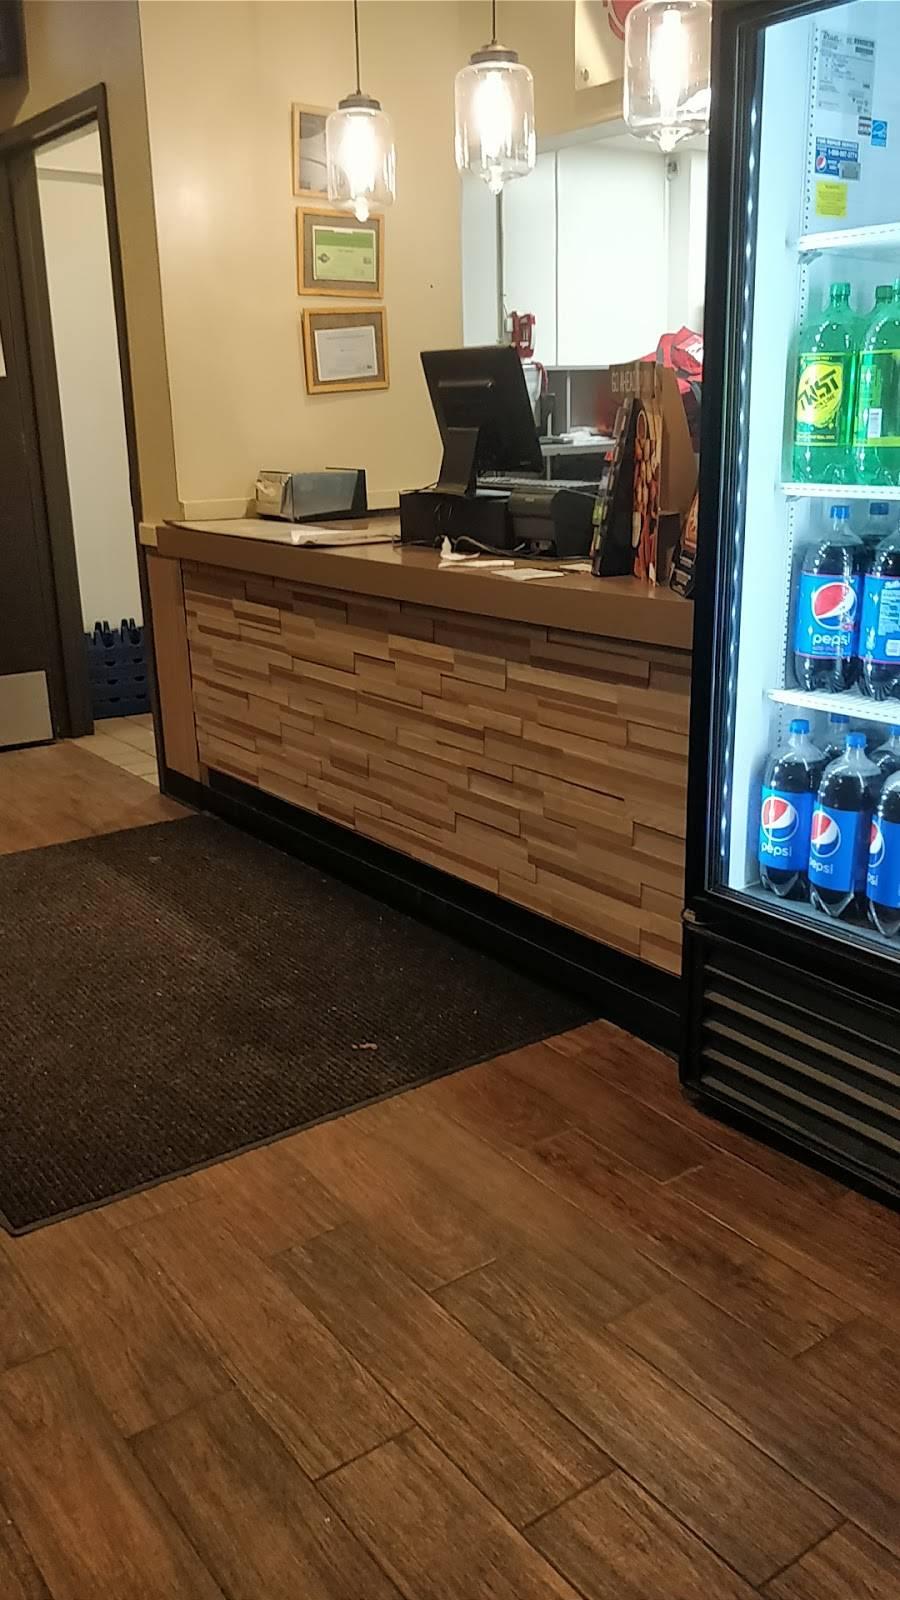 Pizza Hut   restaurant   1347 John F. Kennedy Blvd, Bayonne, NJ 07002, USA   2014368000 OR +1 201-436-8000